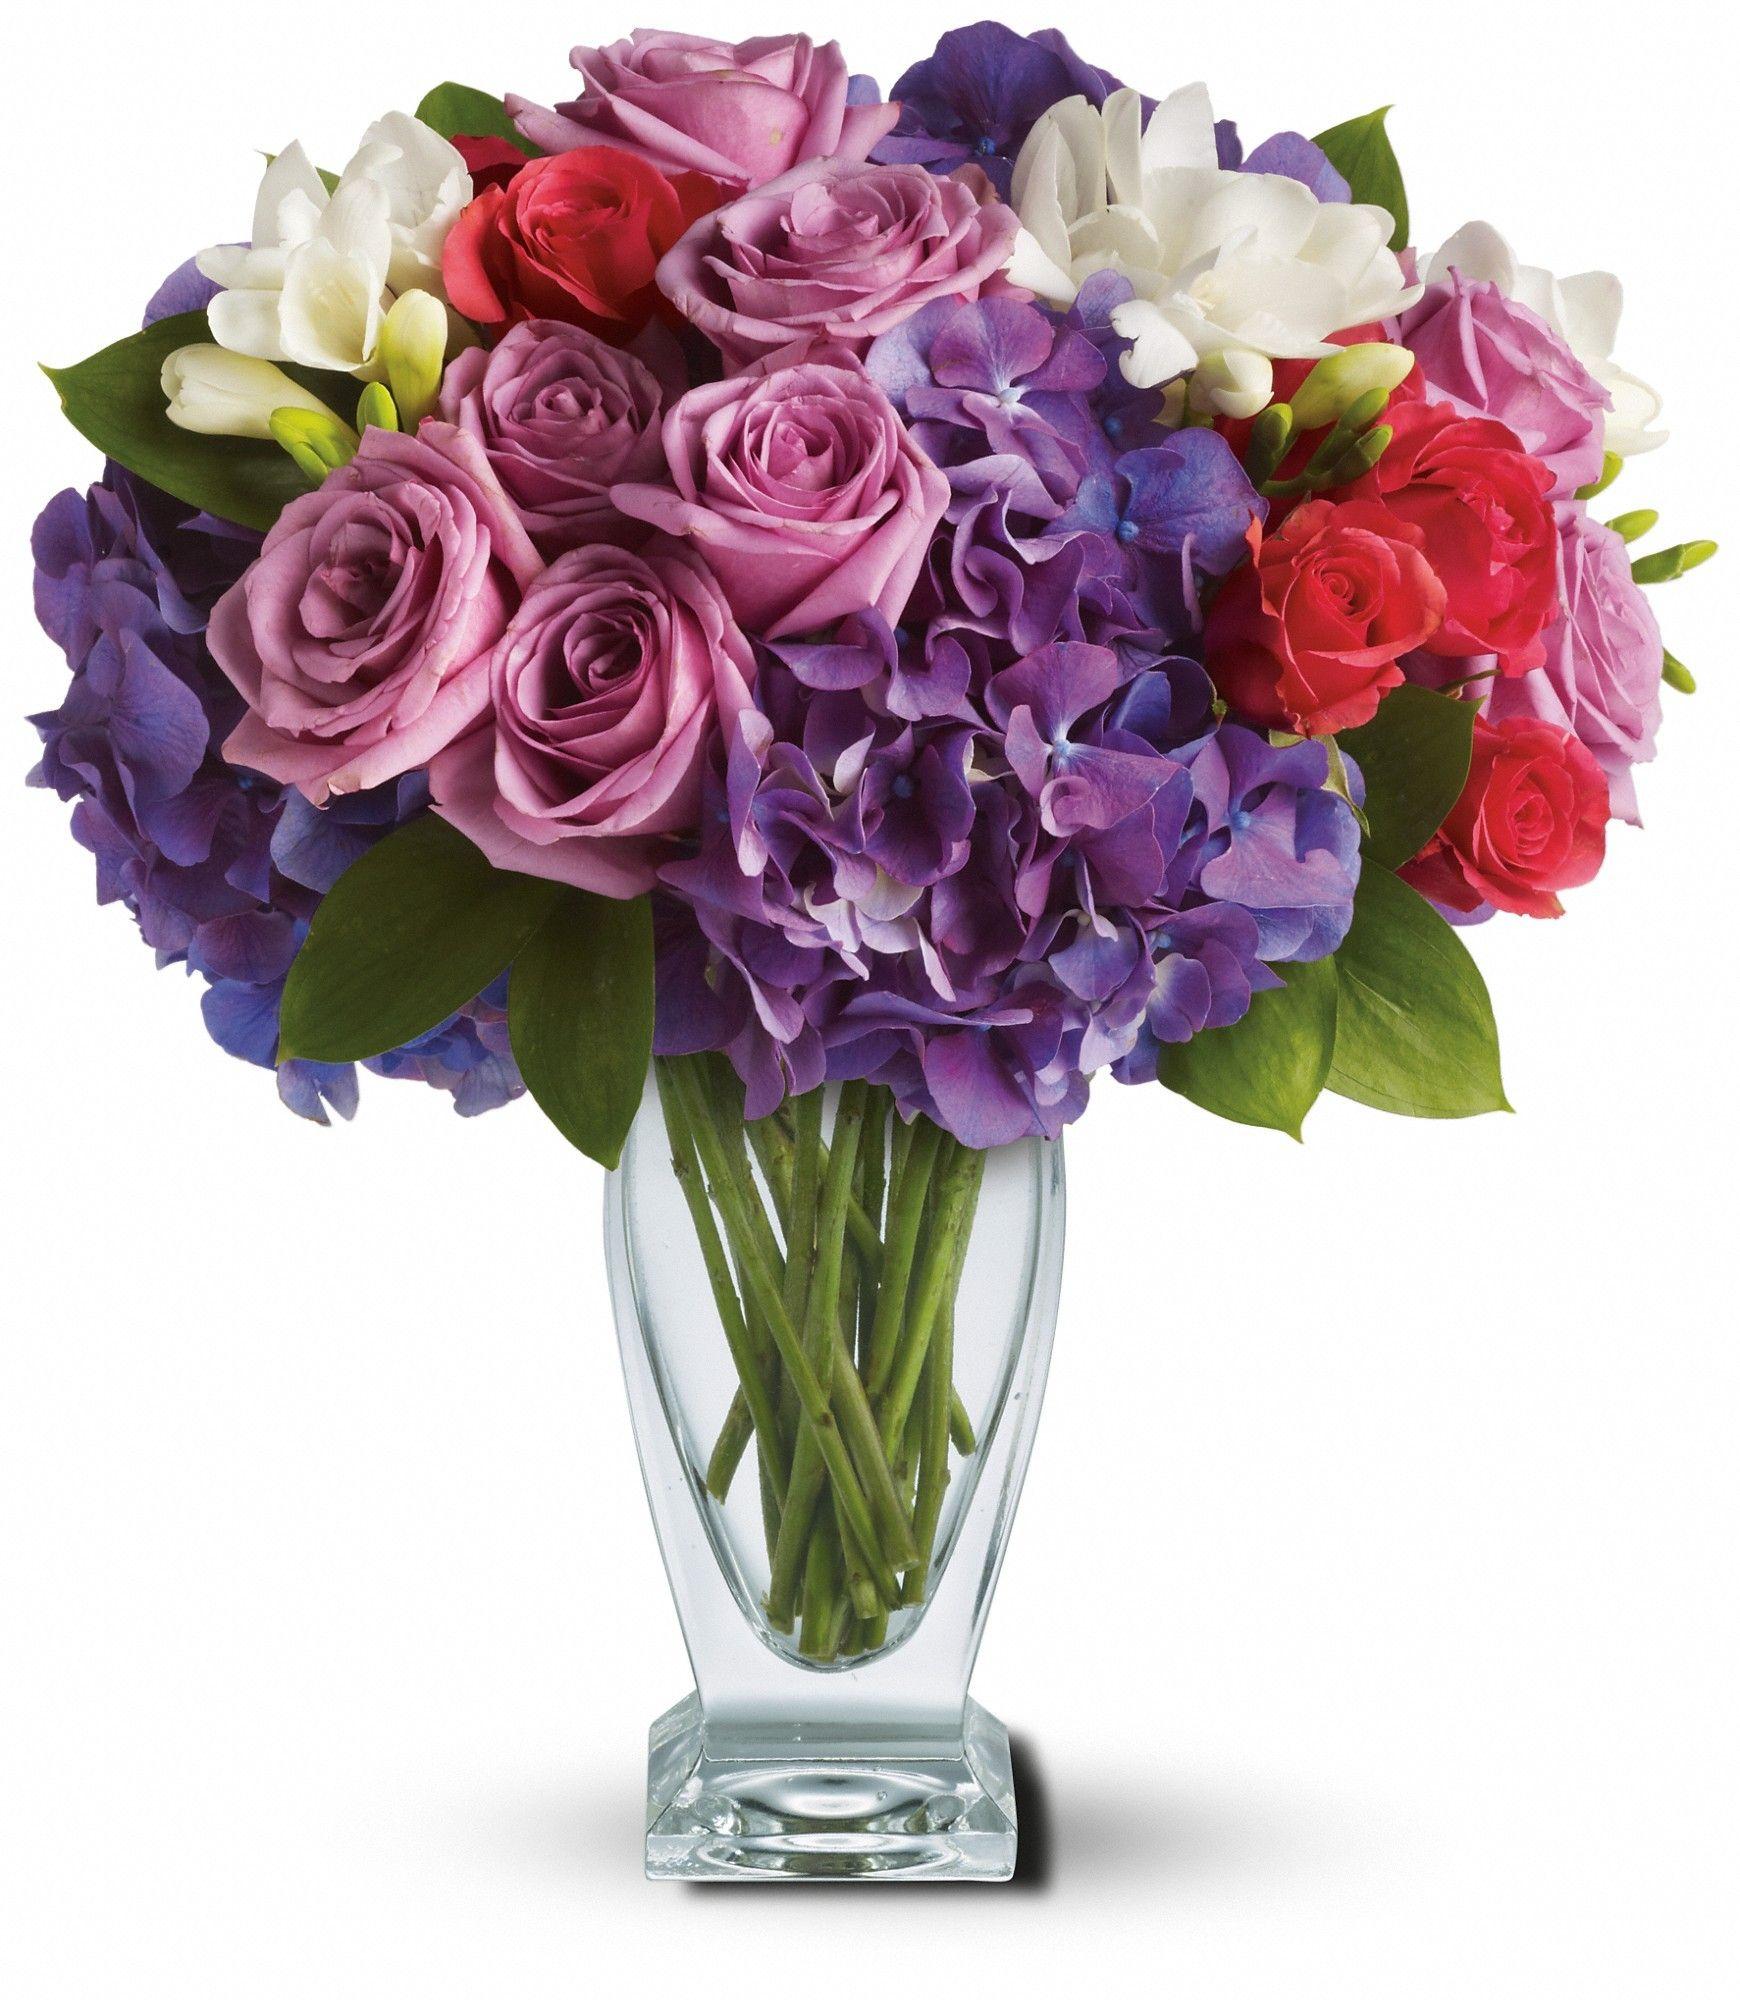 Rhapsody de teleflora en prpura bouquet pinterest floral designs rhapsody in purple send fresh flowers internationally a rhapsody of beauty is on stunning display in this arrangement gorgeous blossoms are beautifully izmirmasajfo